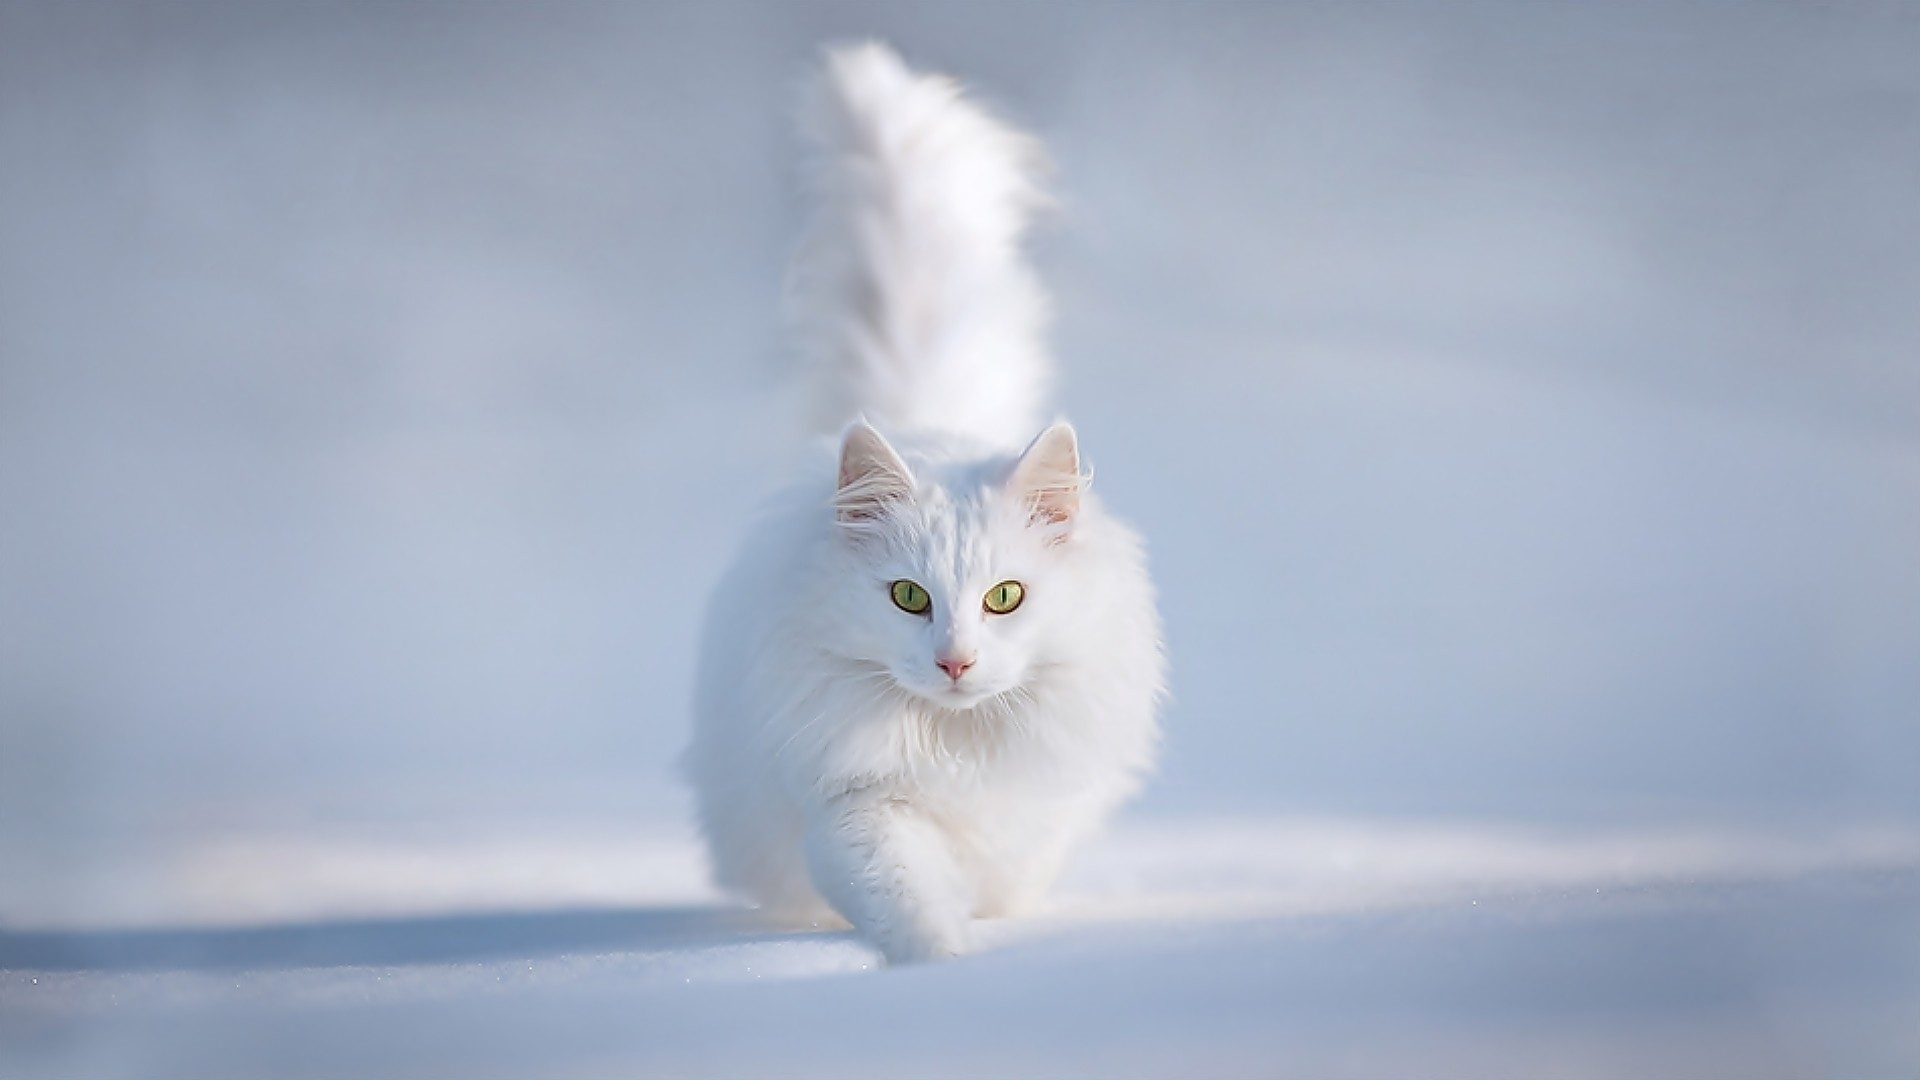 White Cat wallpaper photo hd